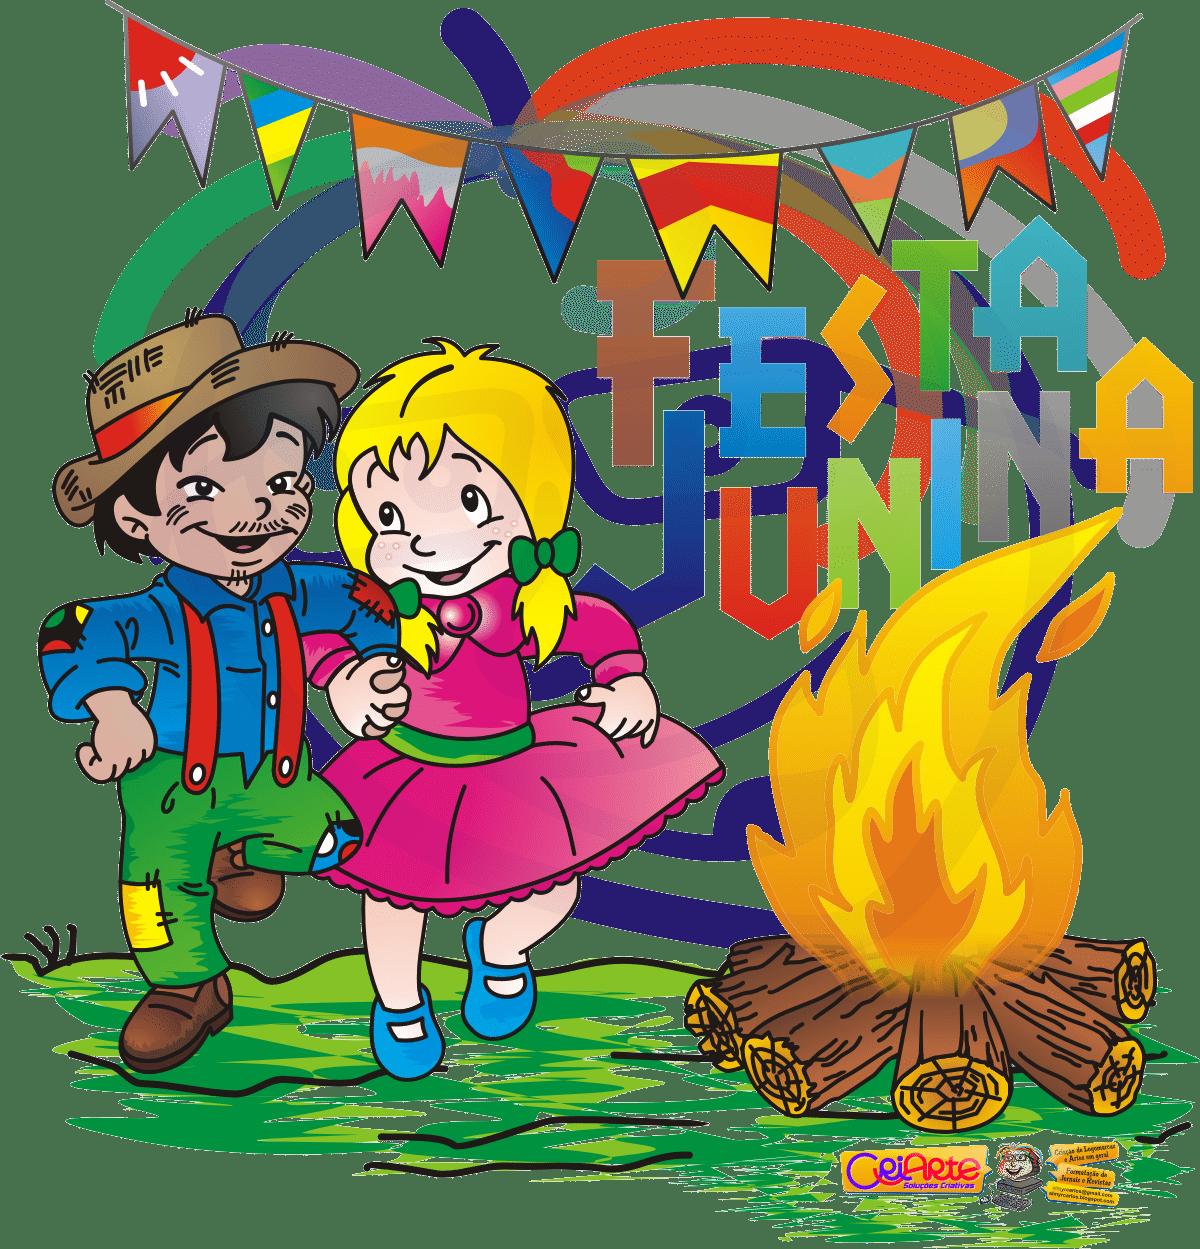 Figuras E Desenhos Coloridos De Festa Junina Para Imprimir